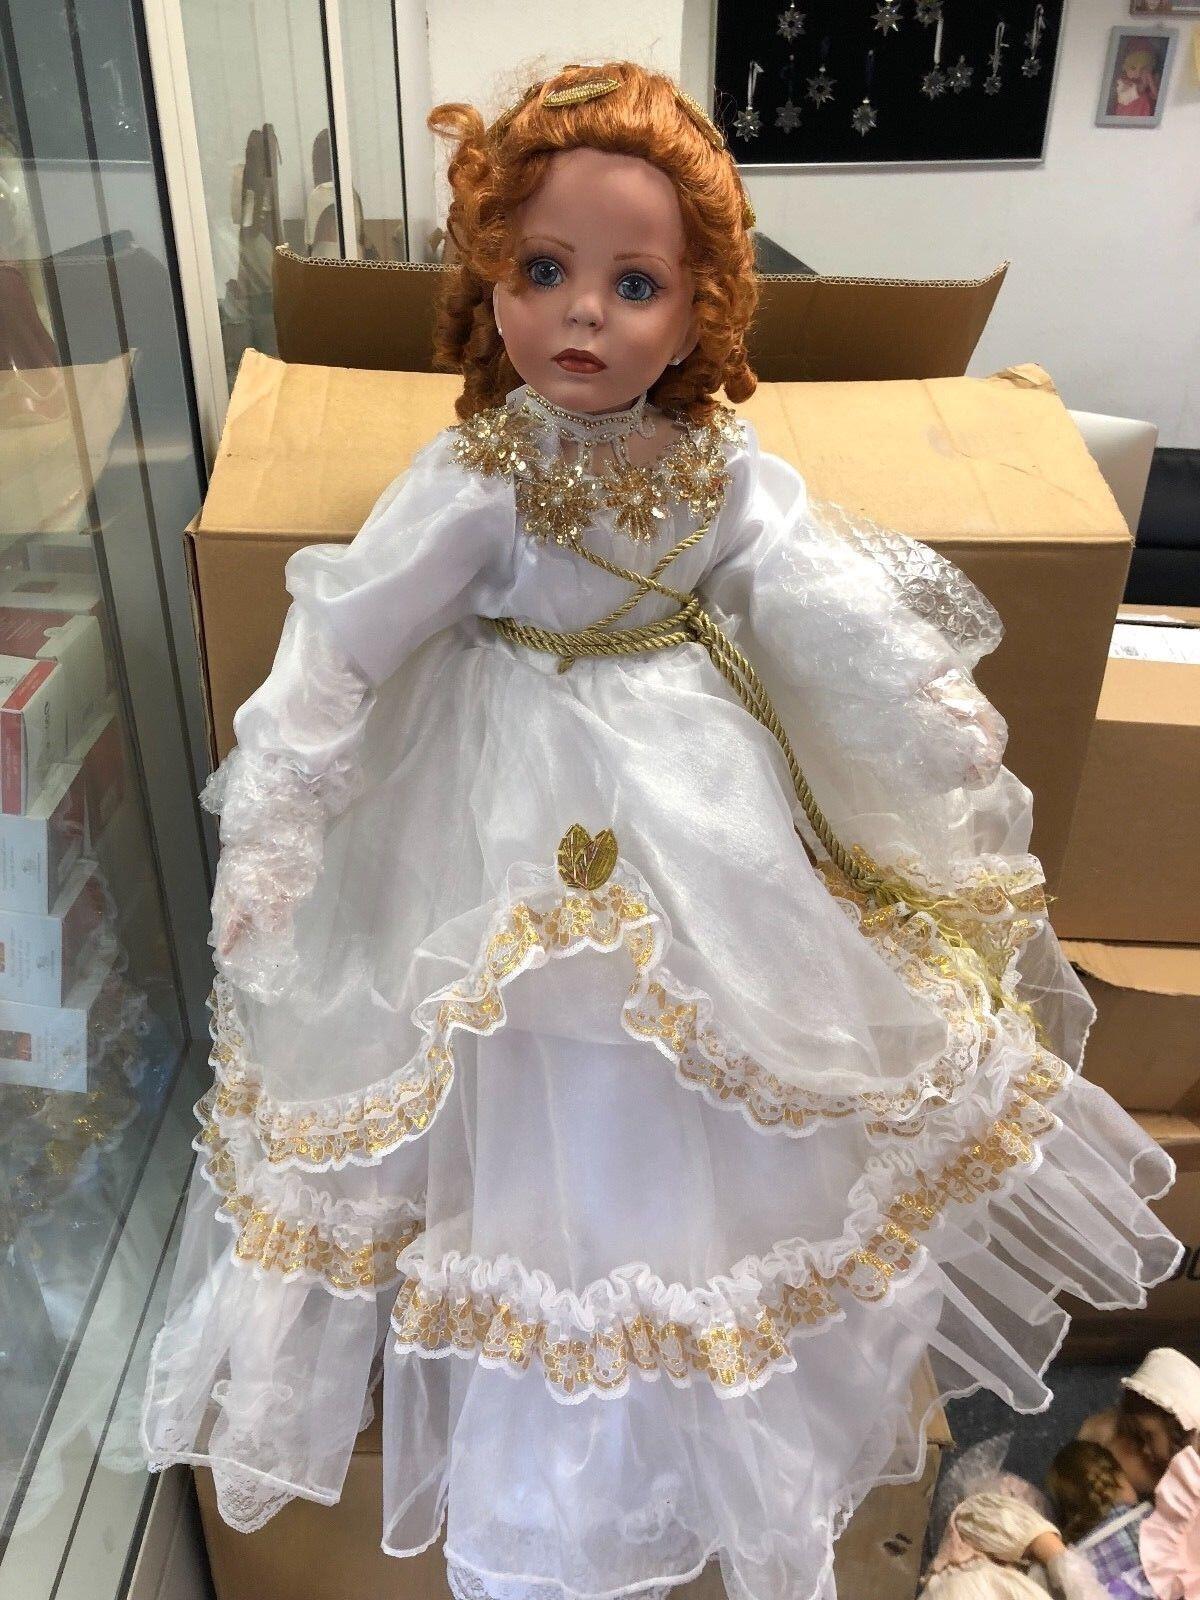 Rustie Rustie Rustie   damen Rubert ⭐⭐  Porzellan Puppe 80 cm. ⭐⭐  Top Zustand 54edd3